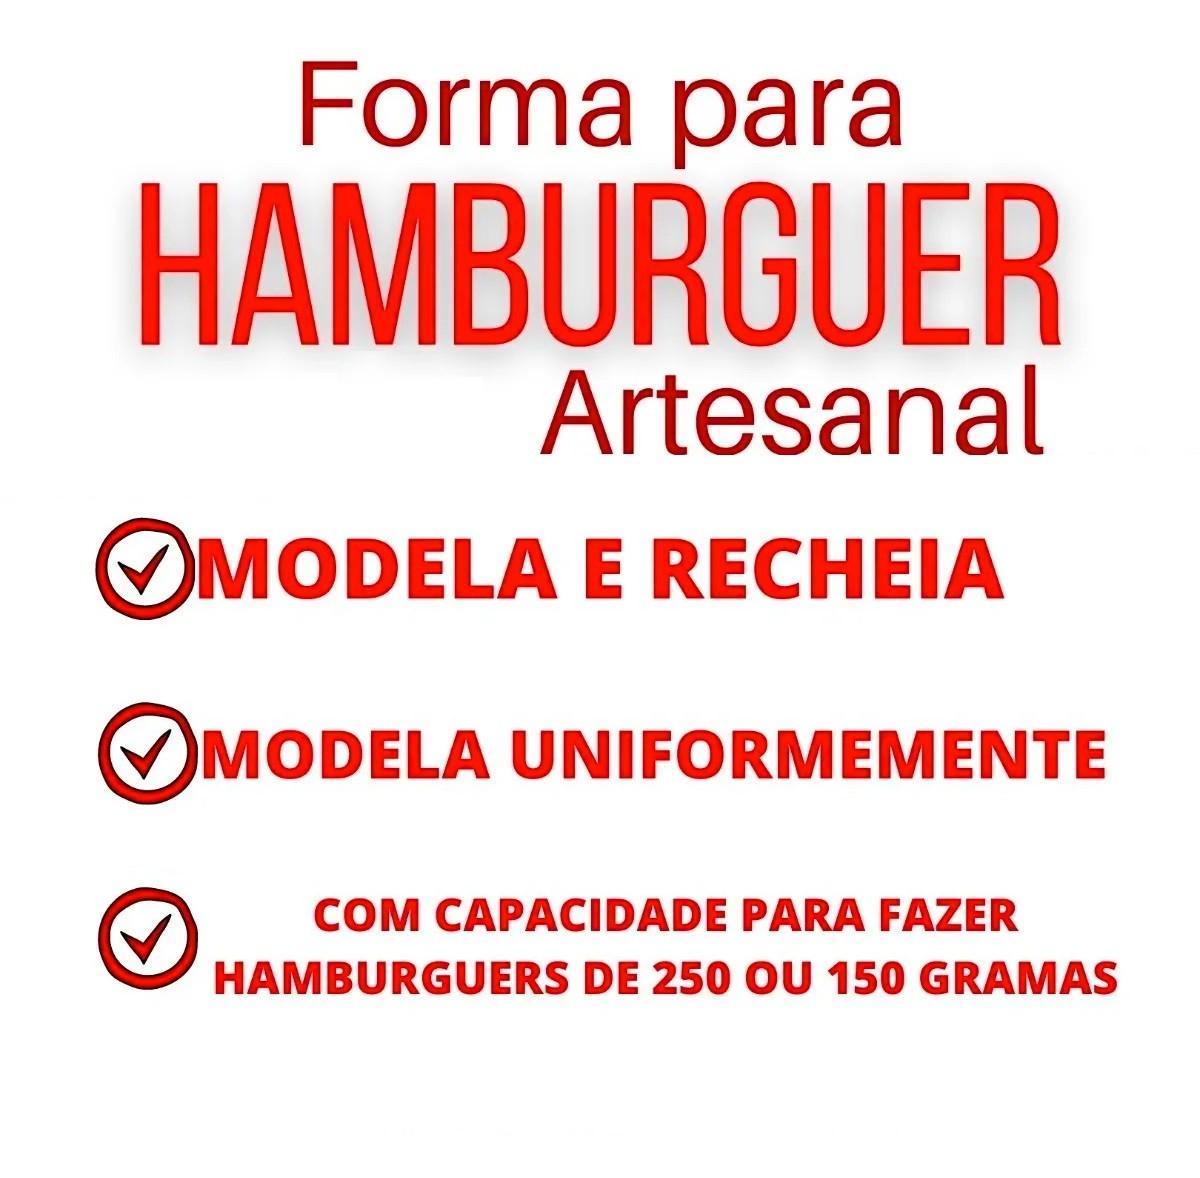 Forma de Hambúrguer Artesanal para Hambúrguer de 150g e 250g